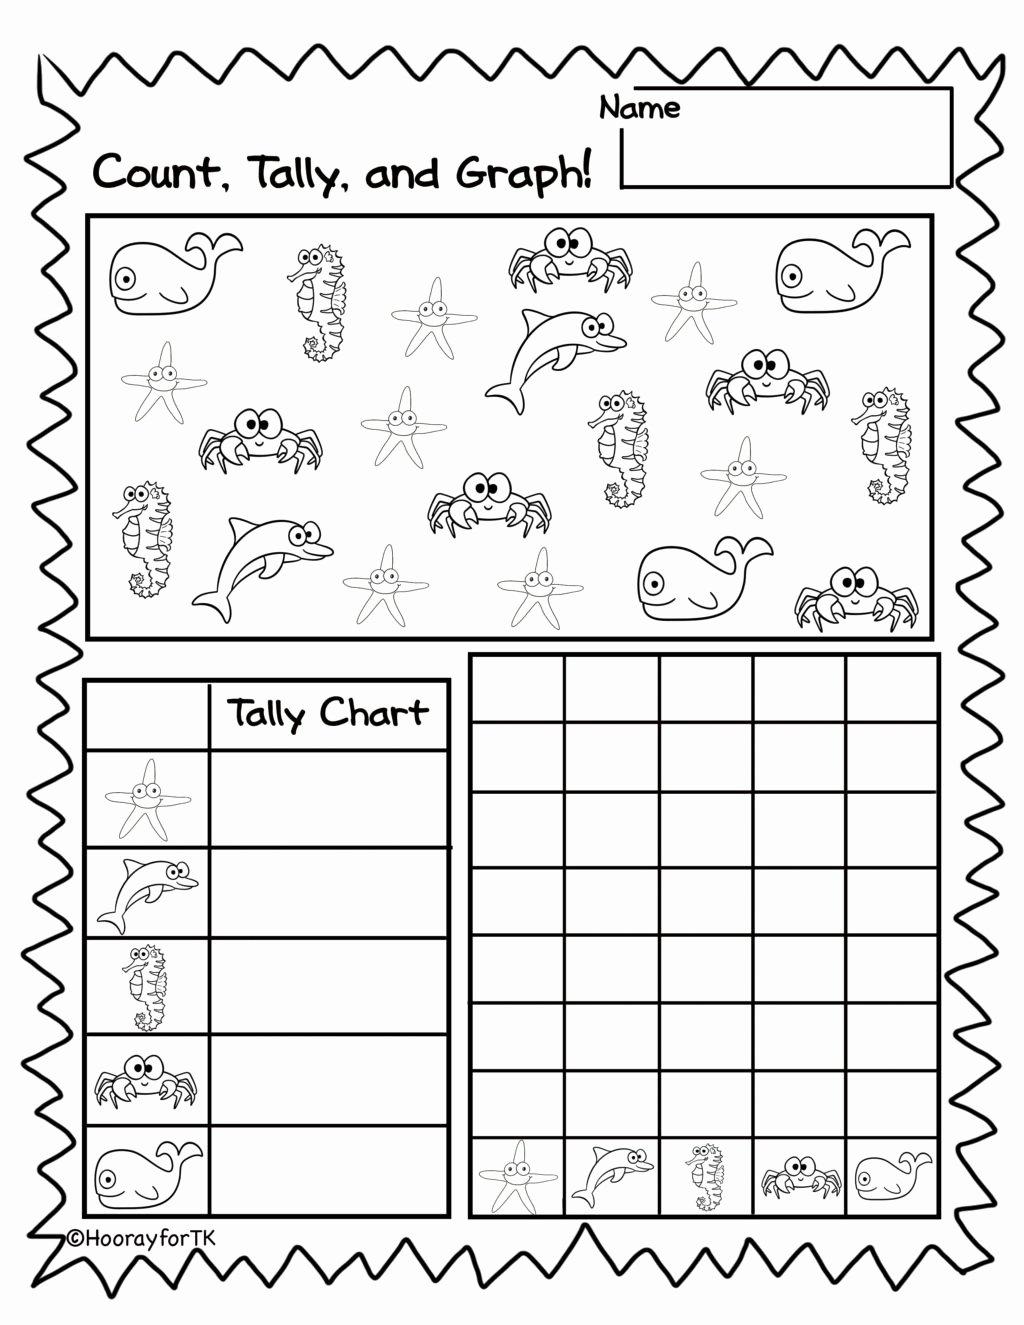 Ocean themed Worksheets for Preschoolers Lovely Worksheet Pre K Printables Image Ideas Printable Under the